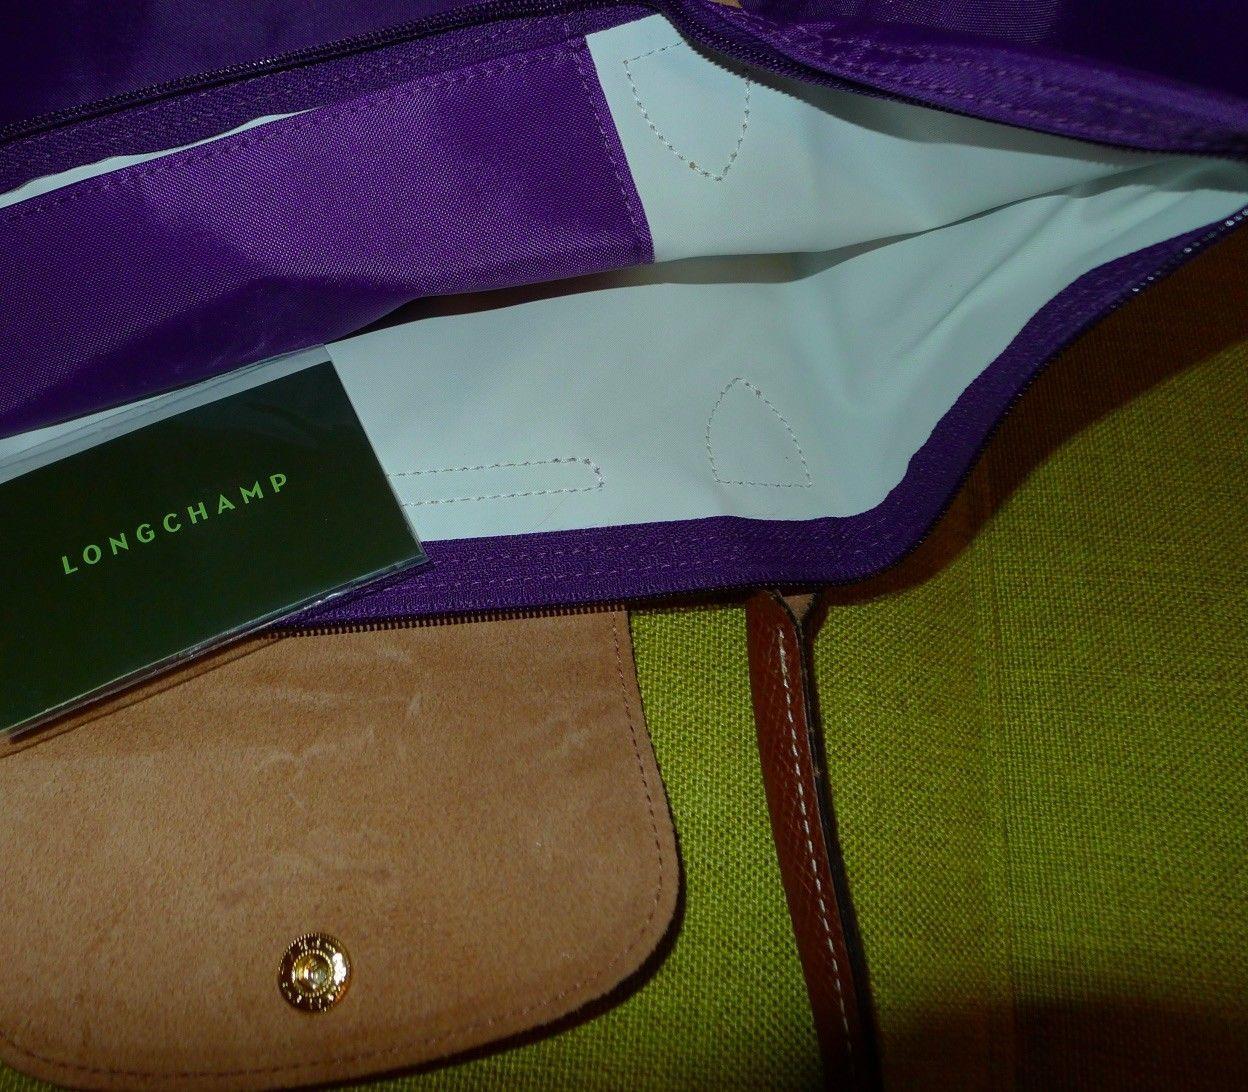 Longchamp Le Pliage Large Nylon Tote amethyst